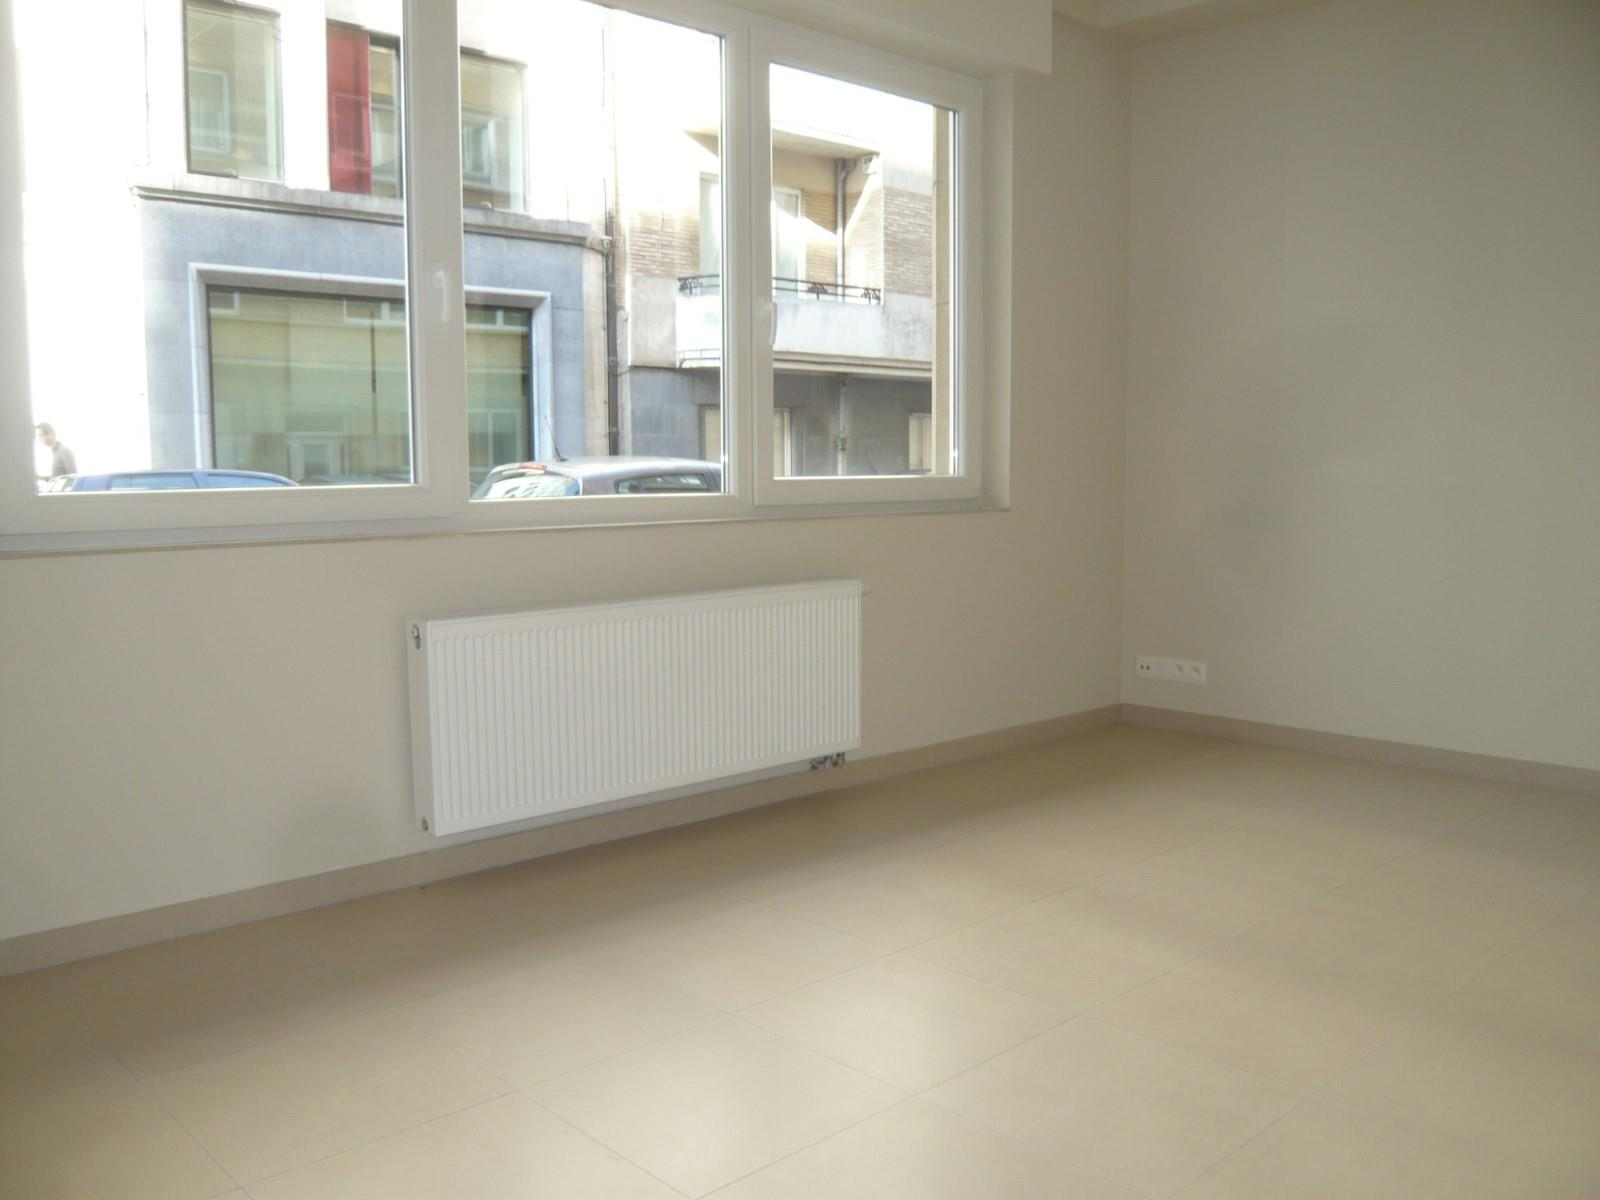 Ground floor - Bruxelles - #2938480-1